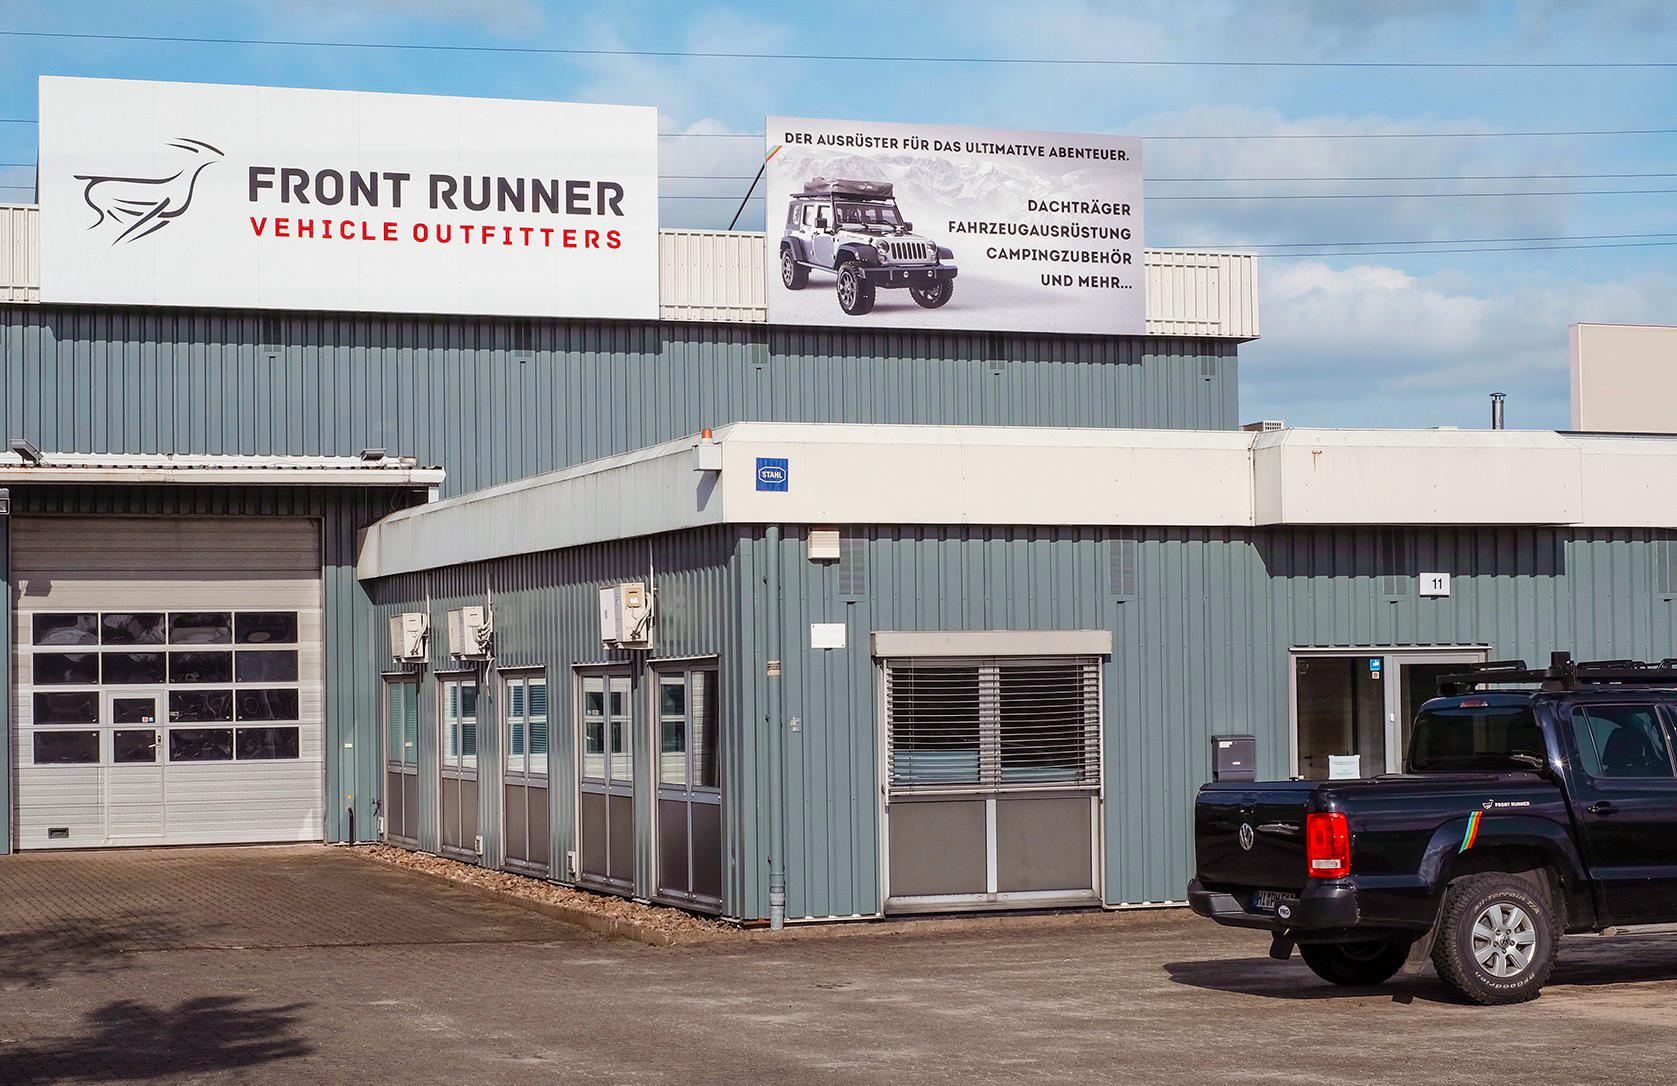 Front Runner Outfitters DACH Show-Room mit Werkstatt